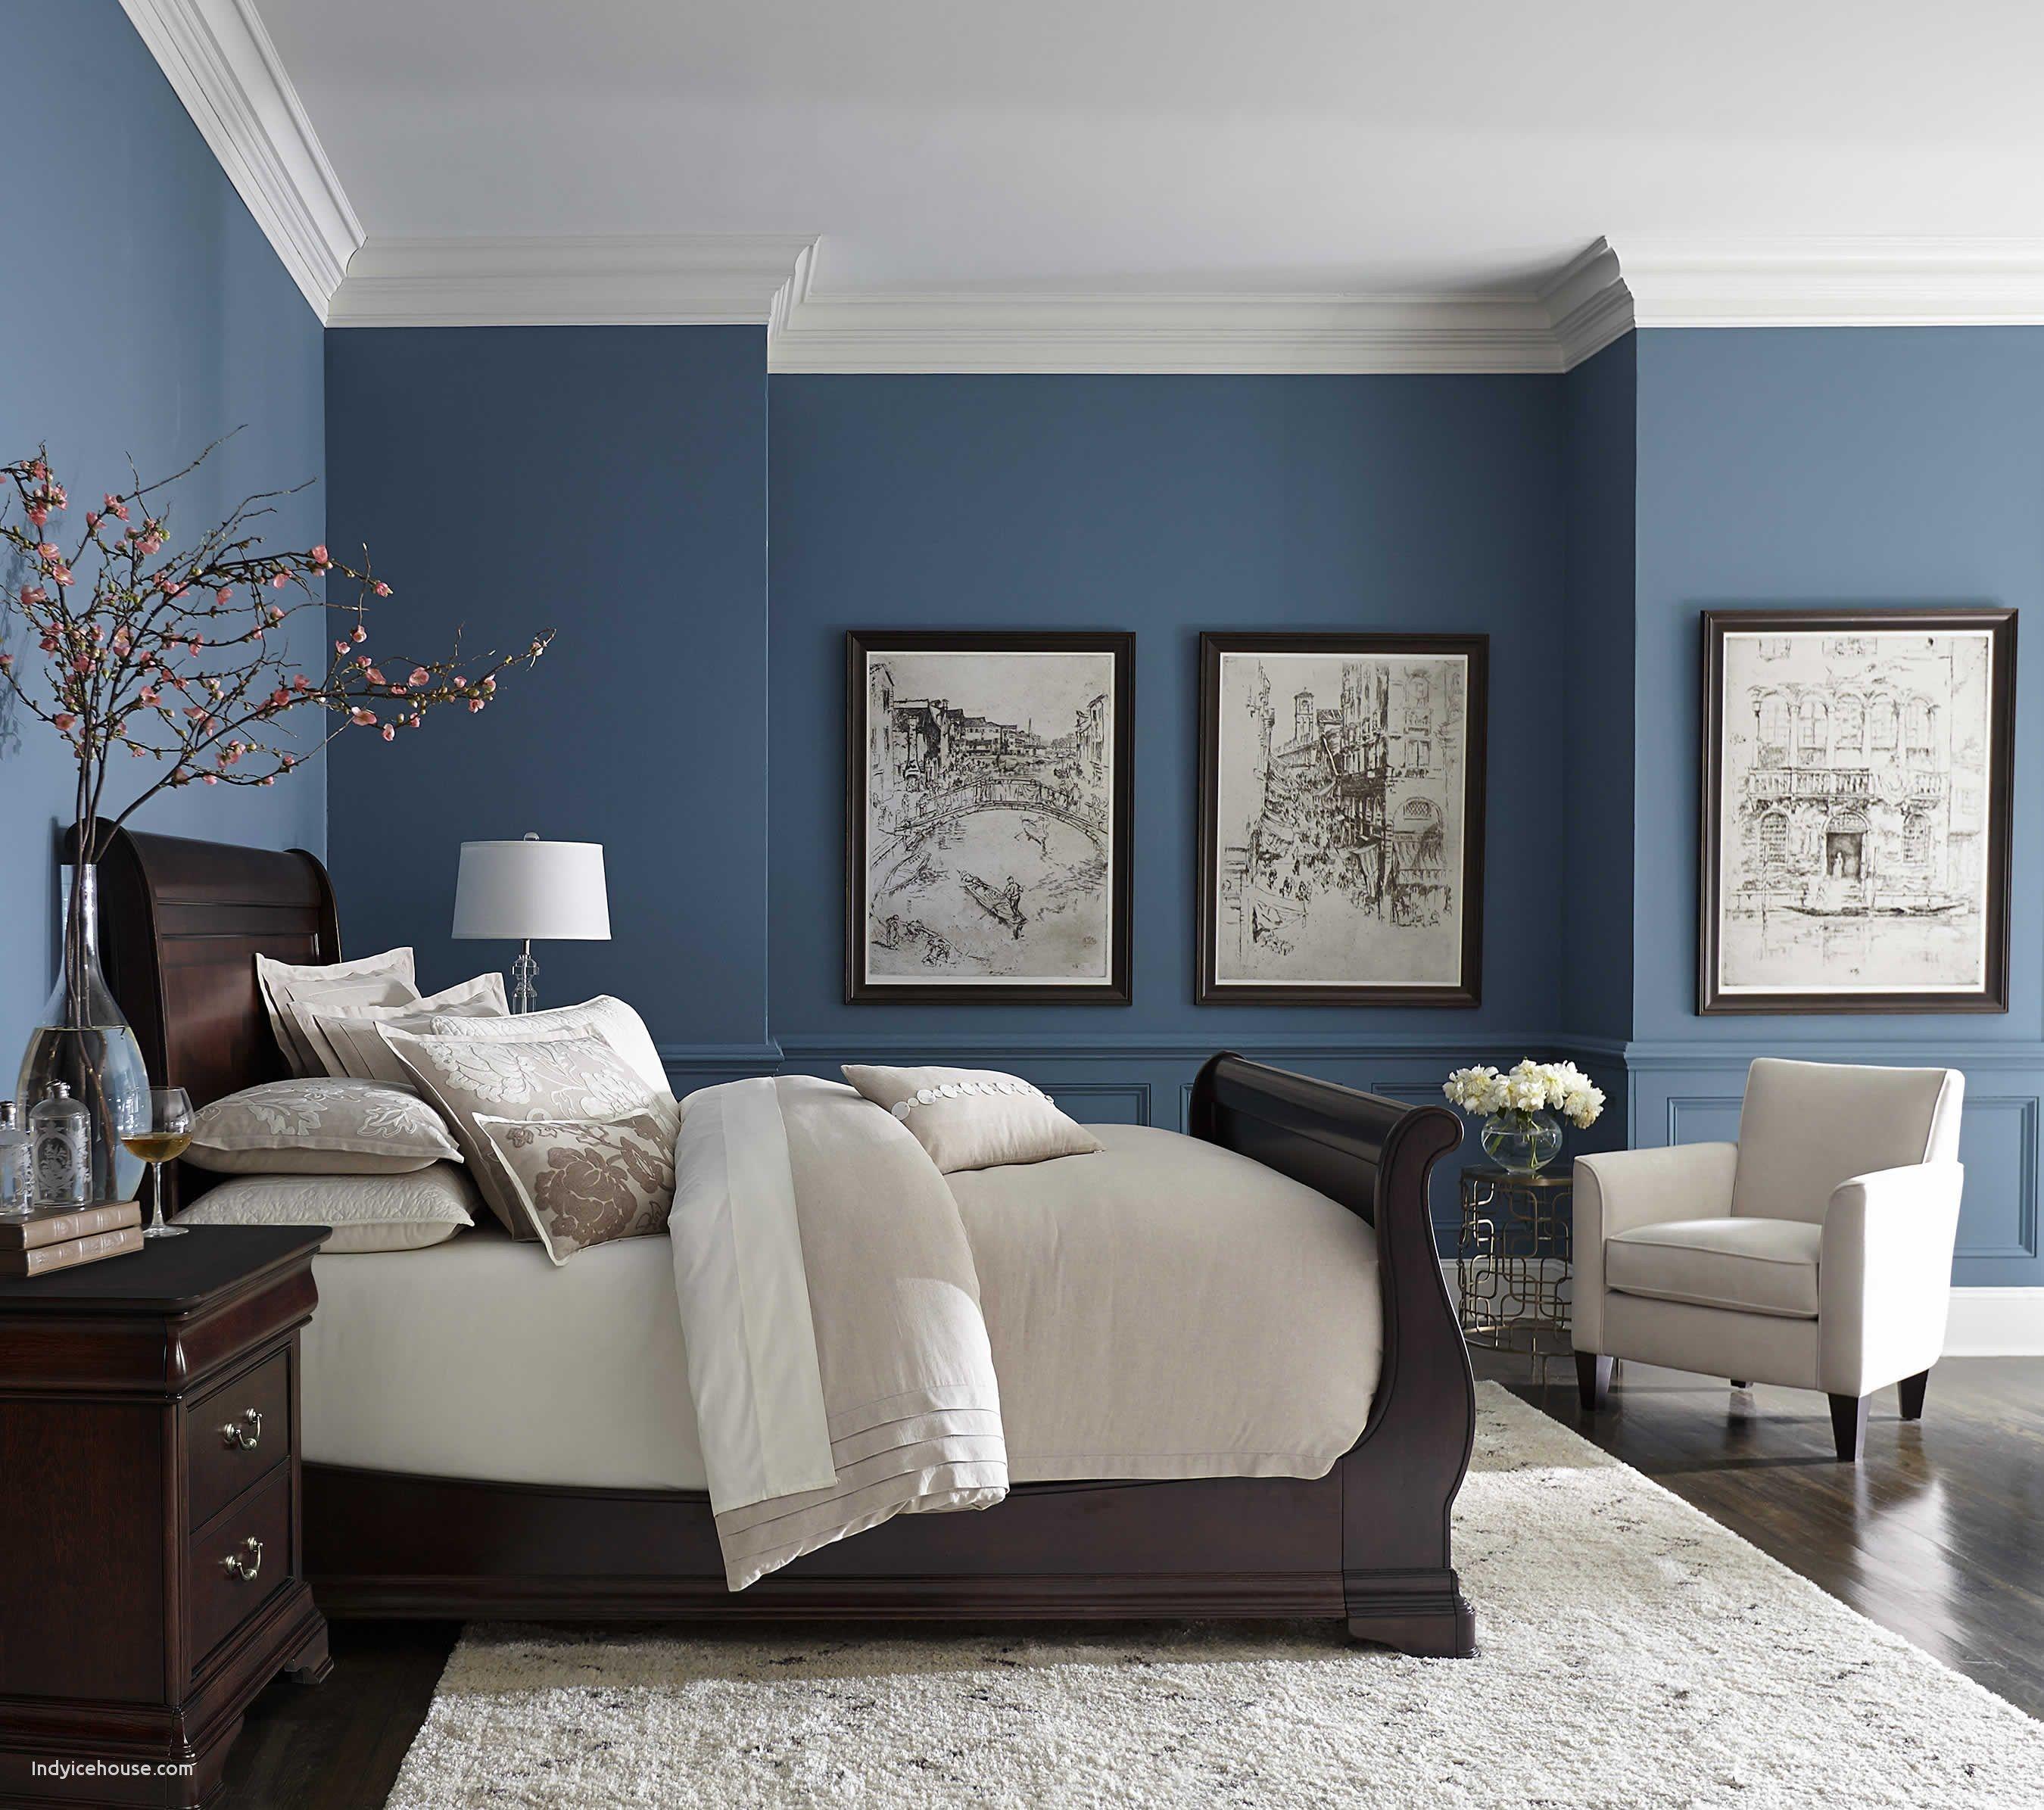 2018 Bedroom Wall Colors With Light Brown Furniture Desain Interior Interior Ide Kamar Tidur